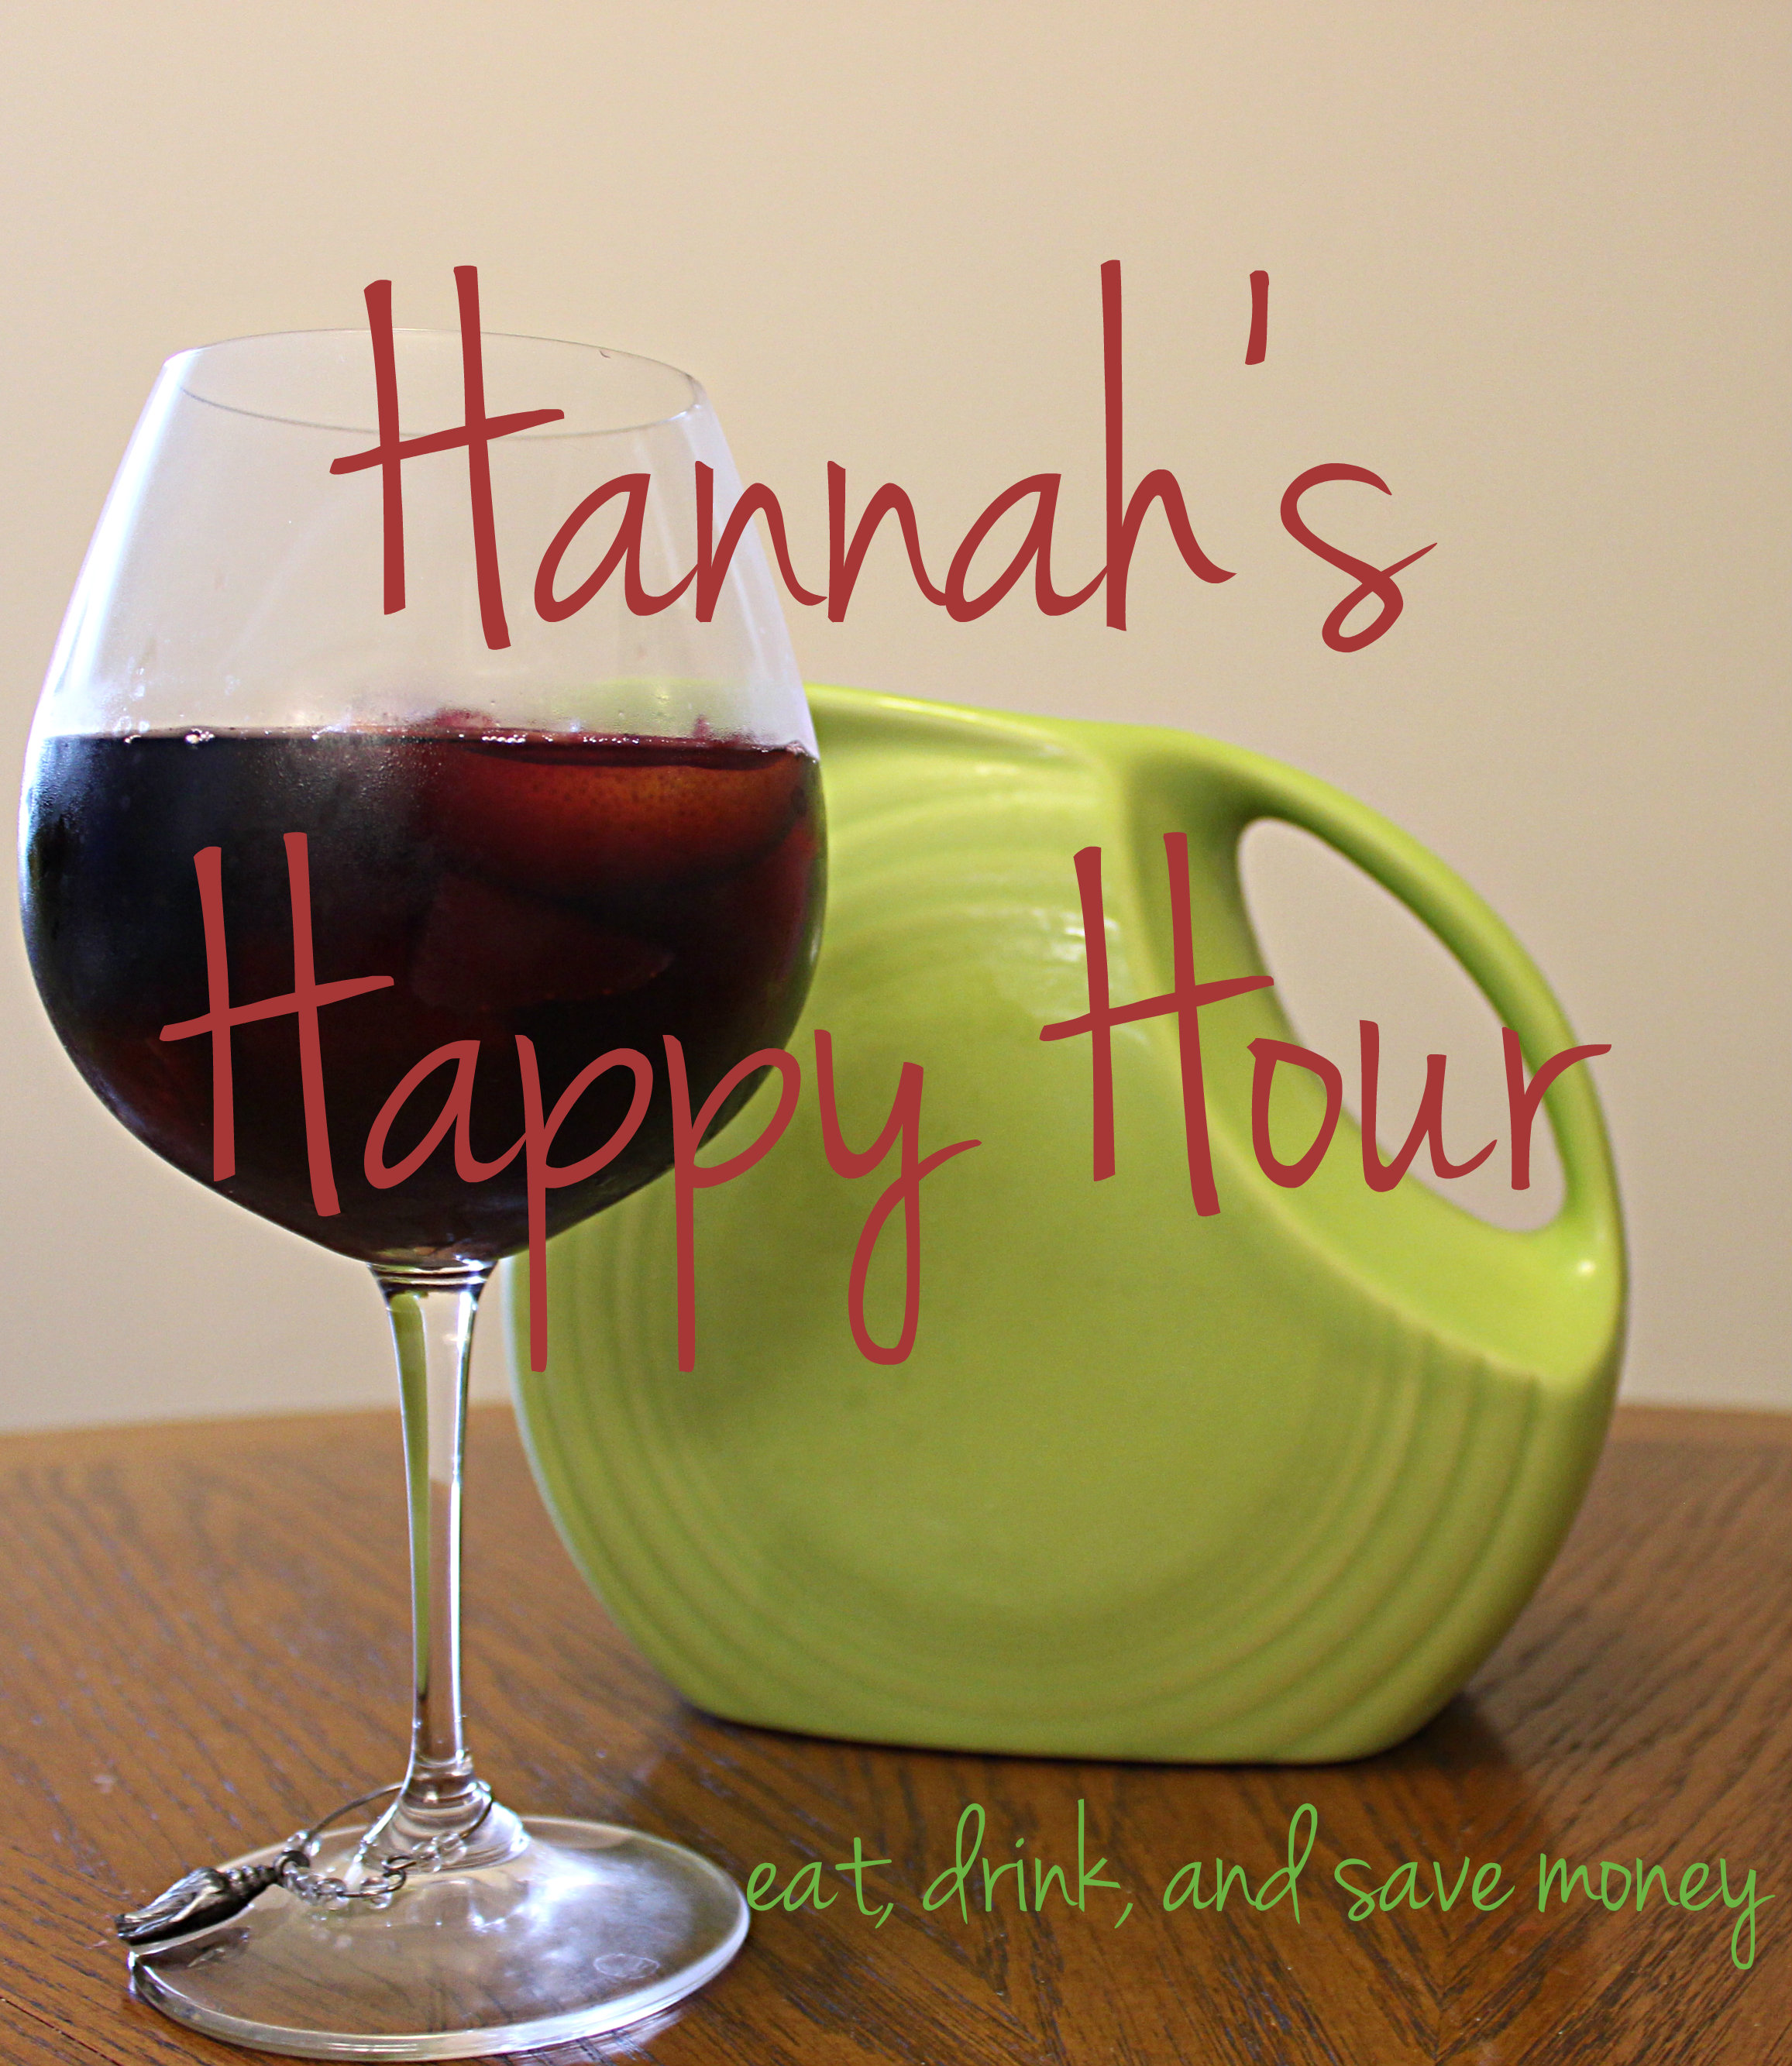 Hannah's Happy Hour